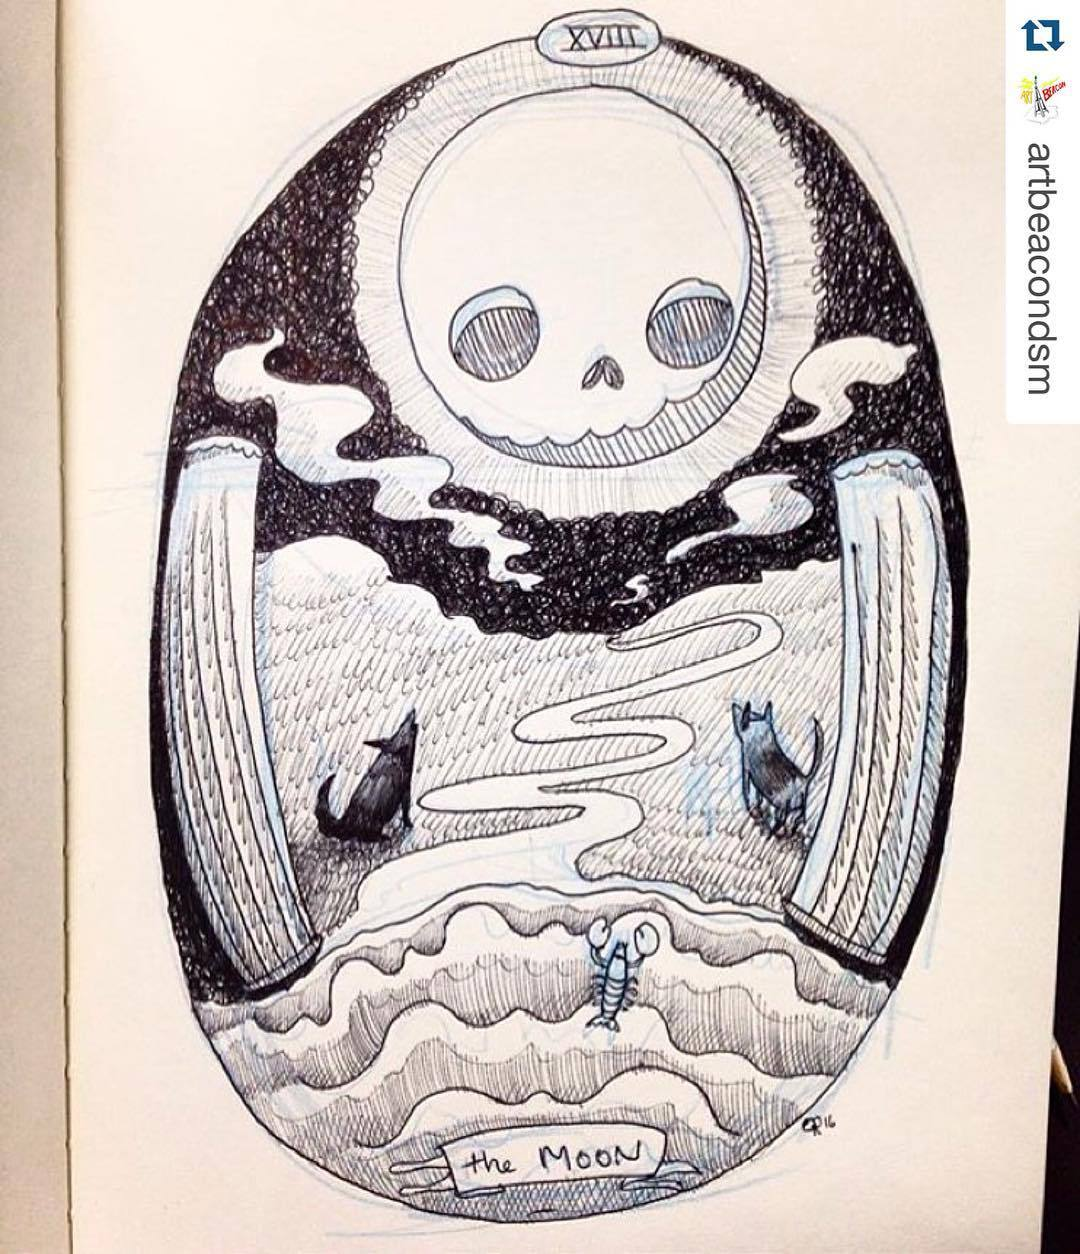 'Skeleton Tarot' at @marscafe Futures predicted Tonight 6 PM #artbeacondsm  …  #Repost @artbeacondsm by ooomami  http://ift.tt/1X0rbGD